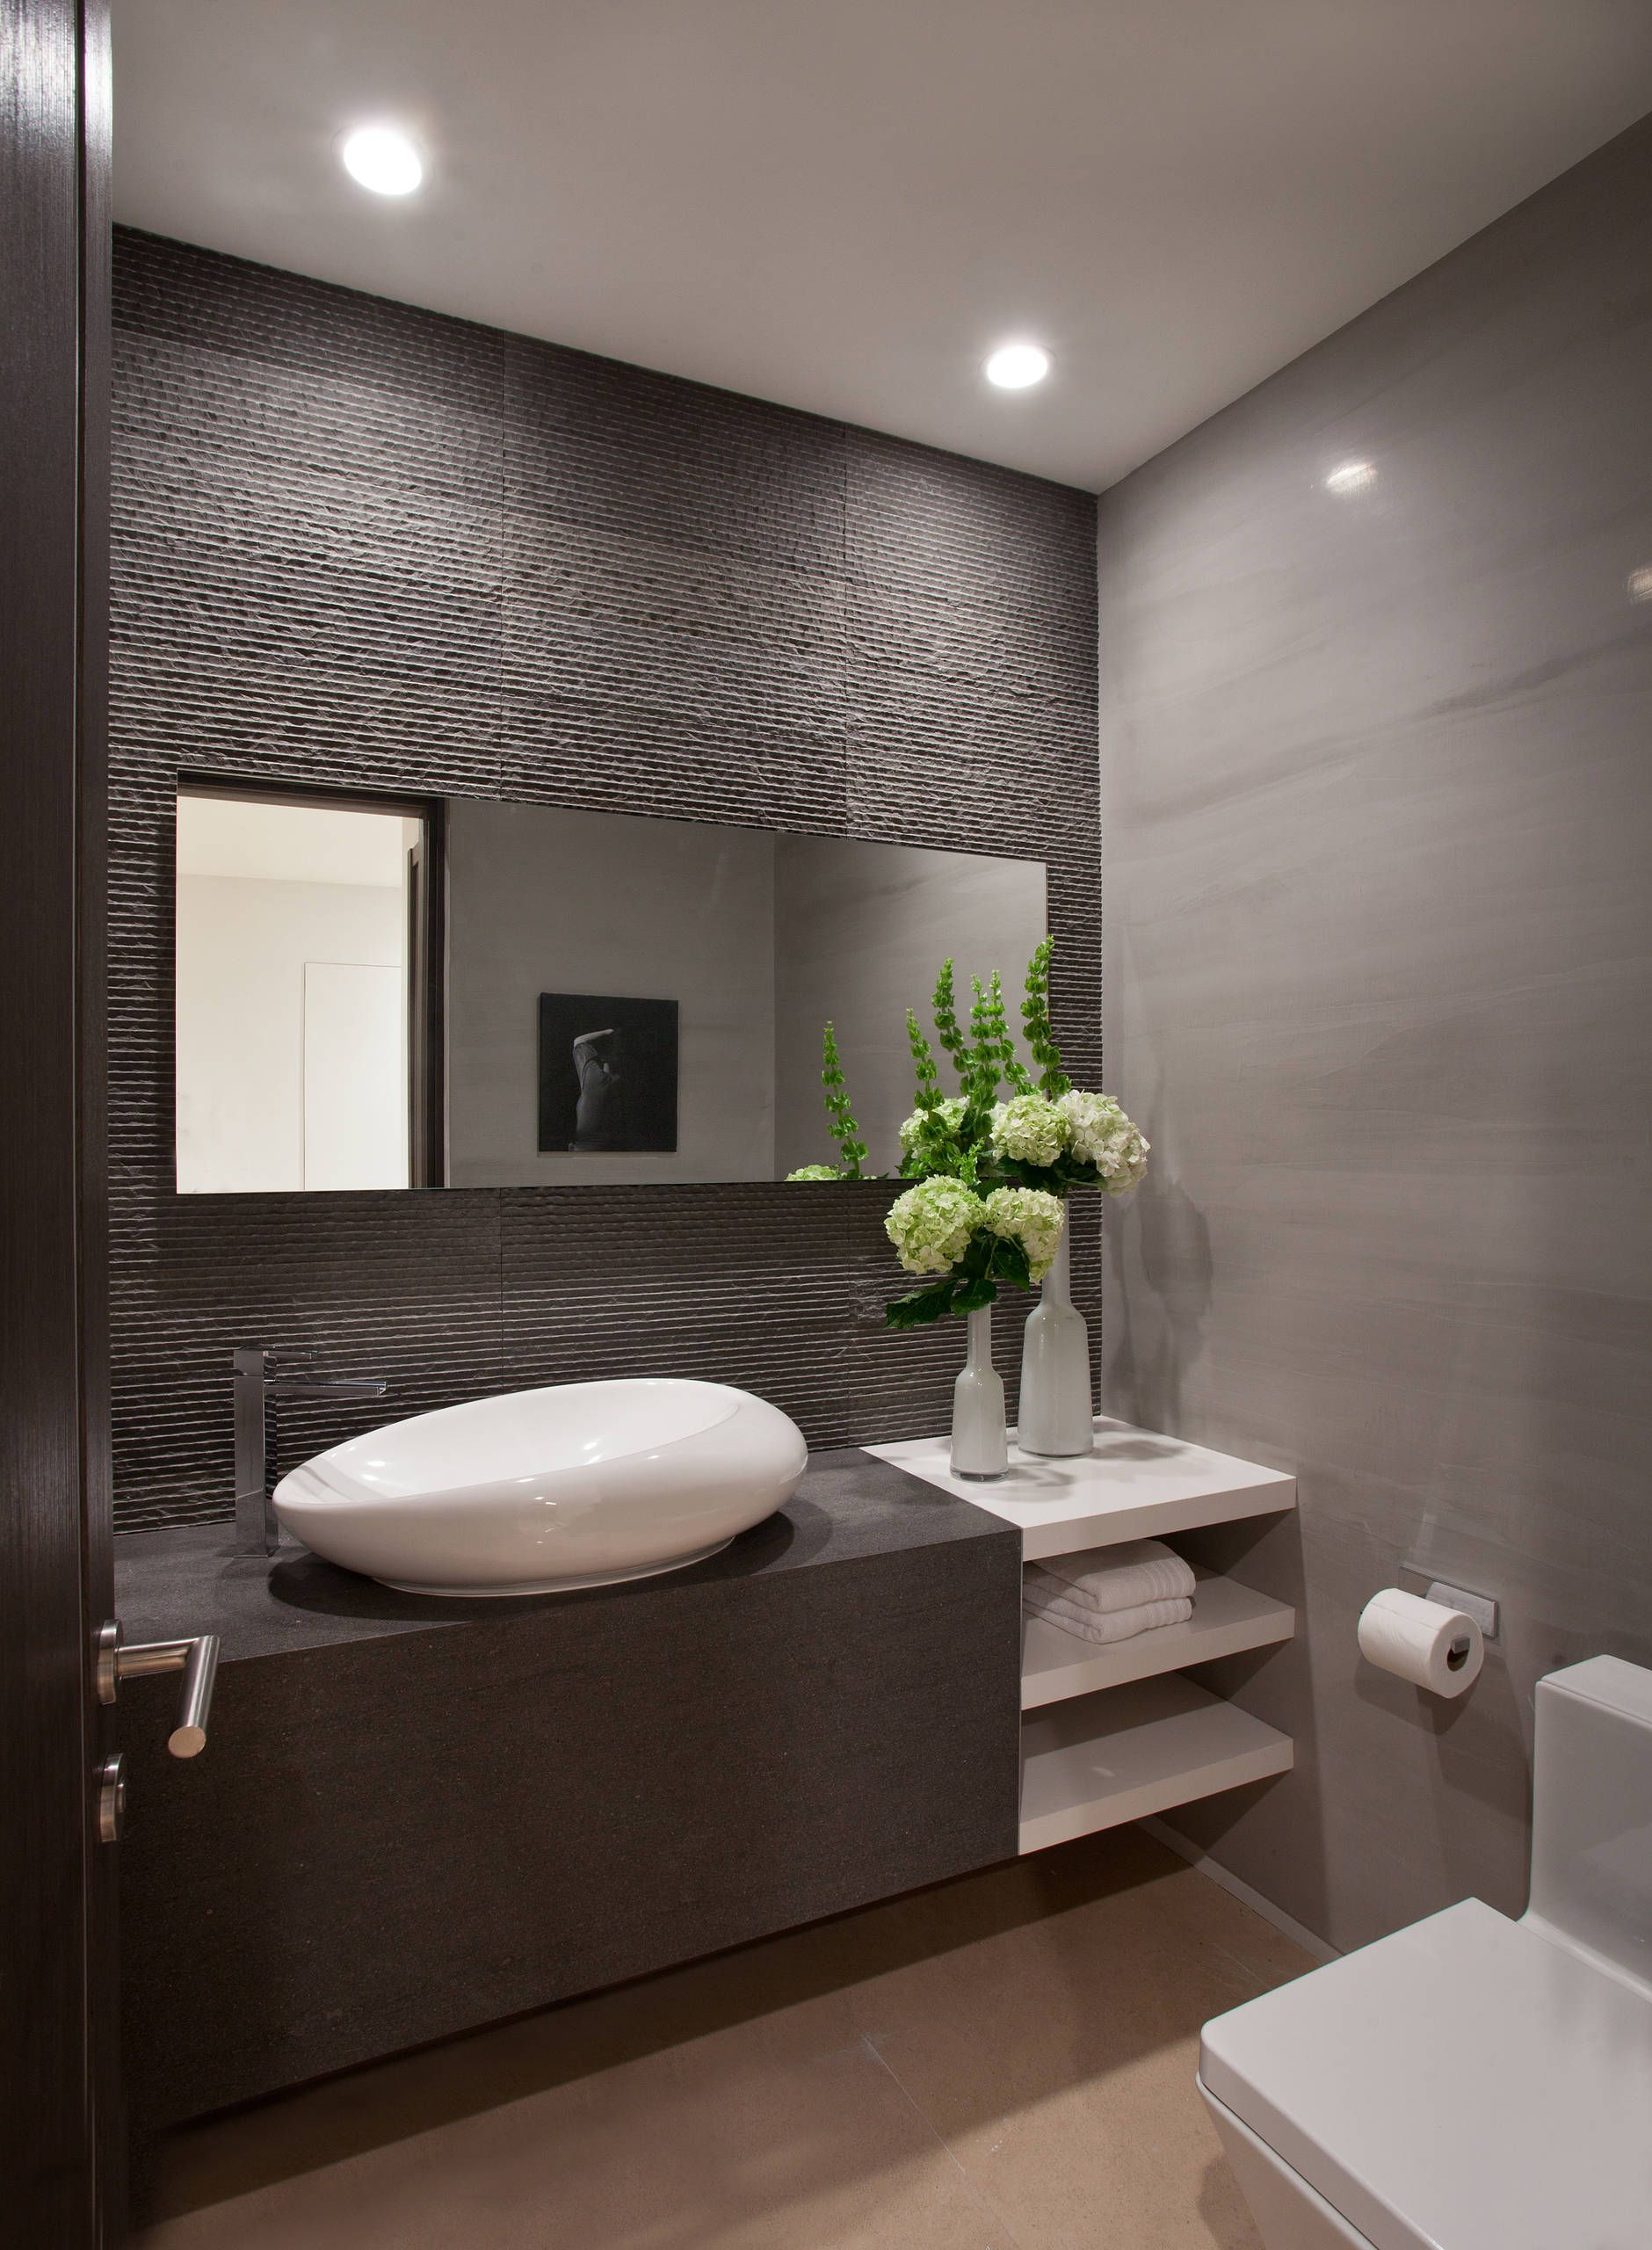 Golden Beach Contemporary Bathroom Minimalist Bathroom Design